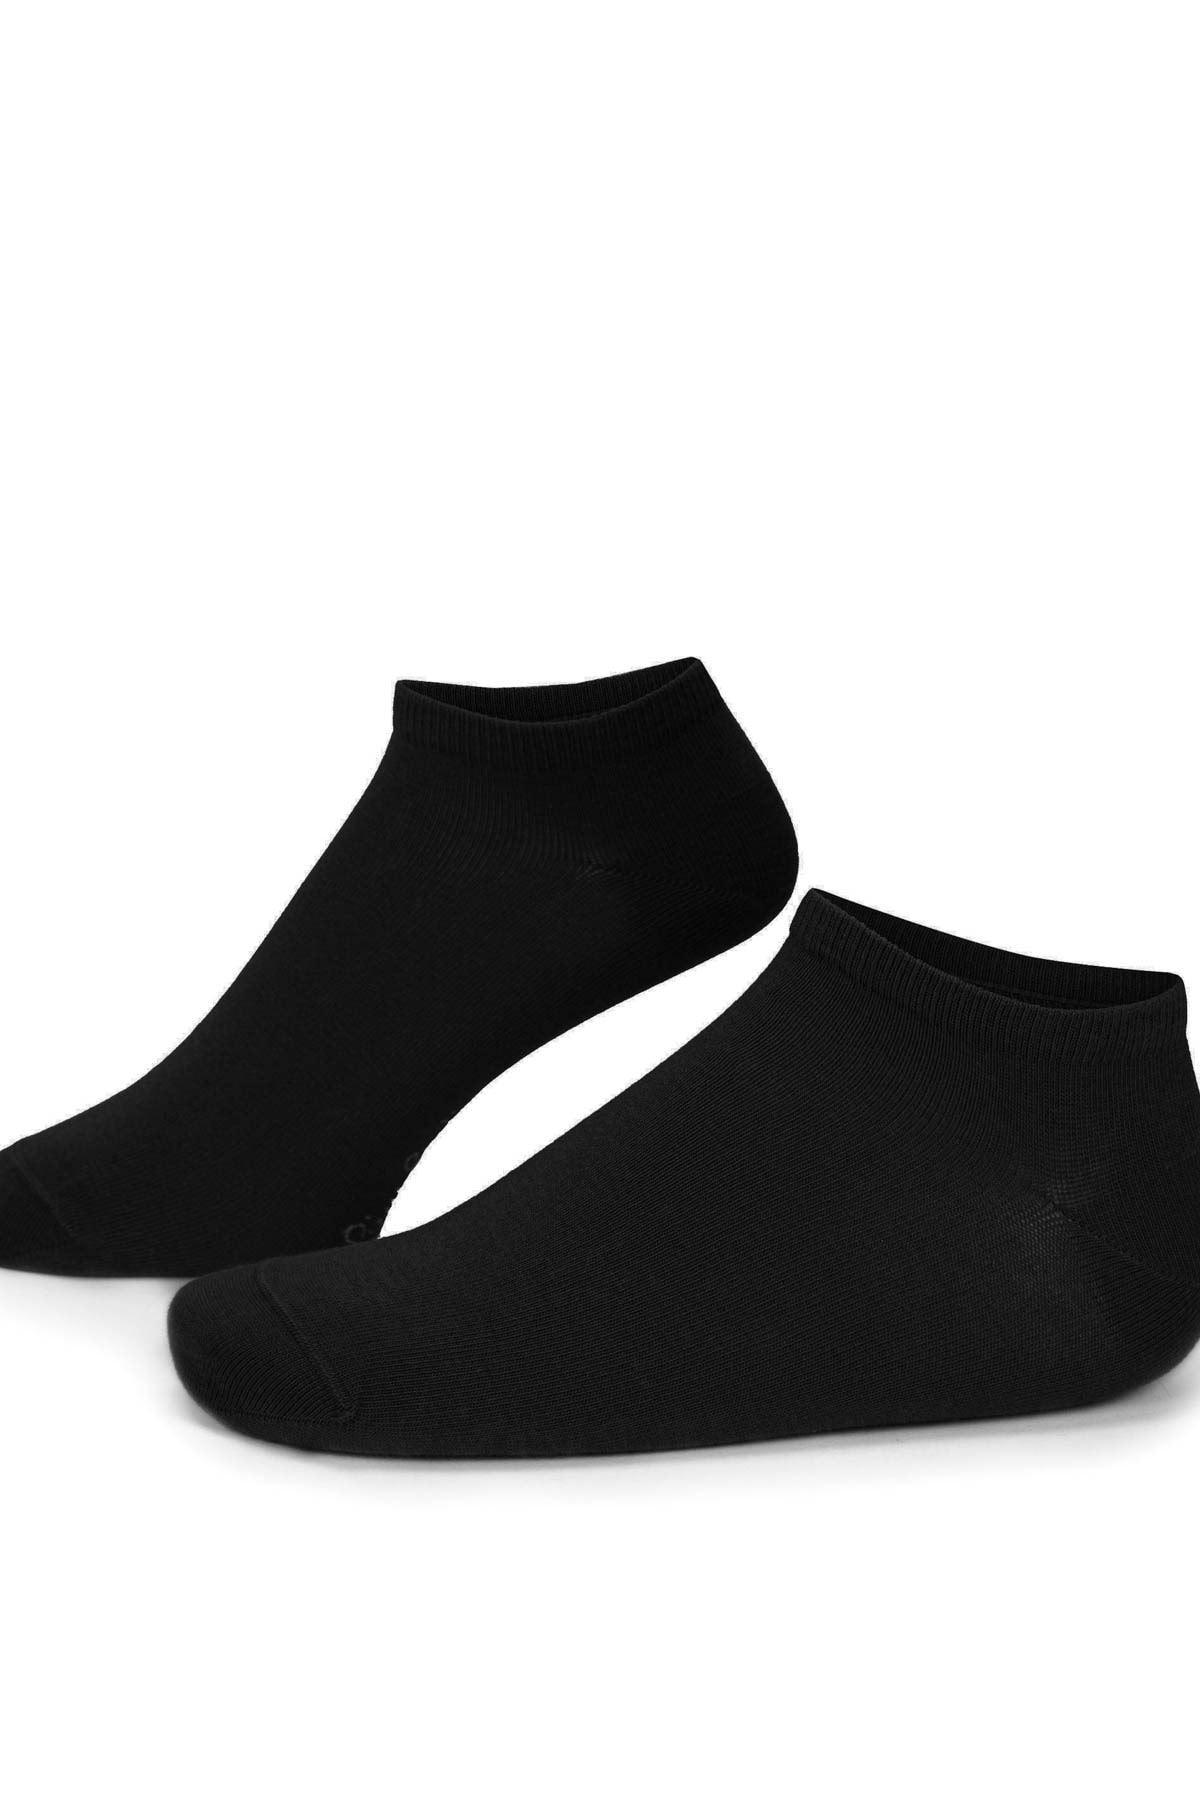 7 Adet Siyah Erkek Patik Çorap (40-44)